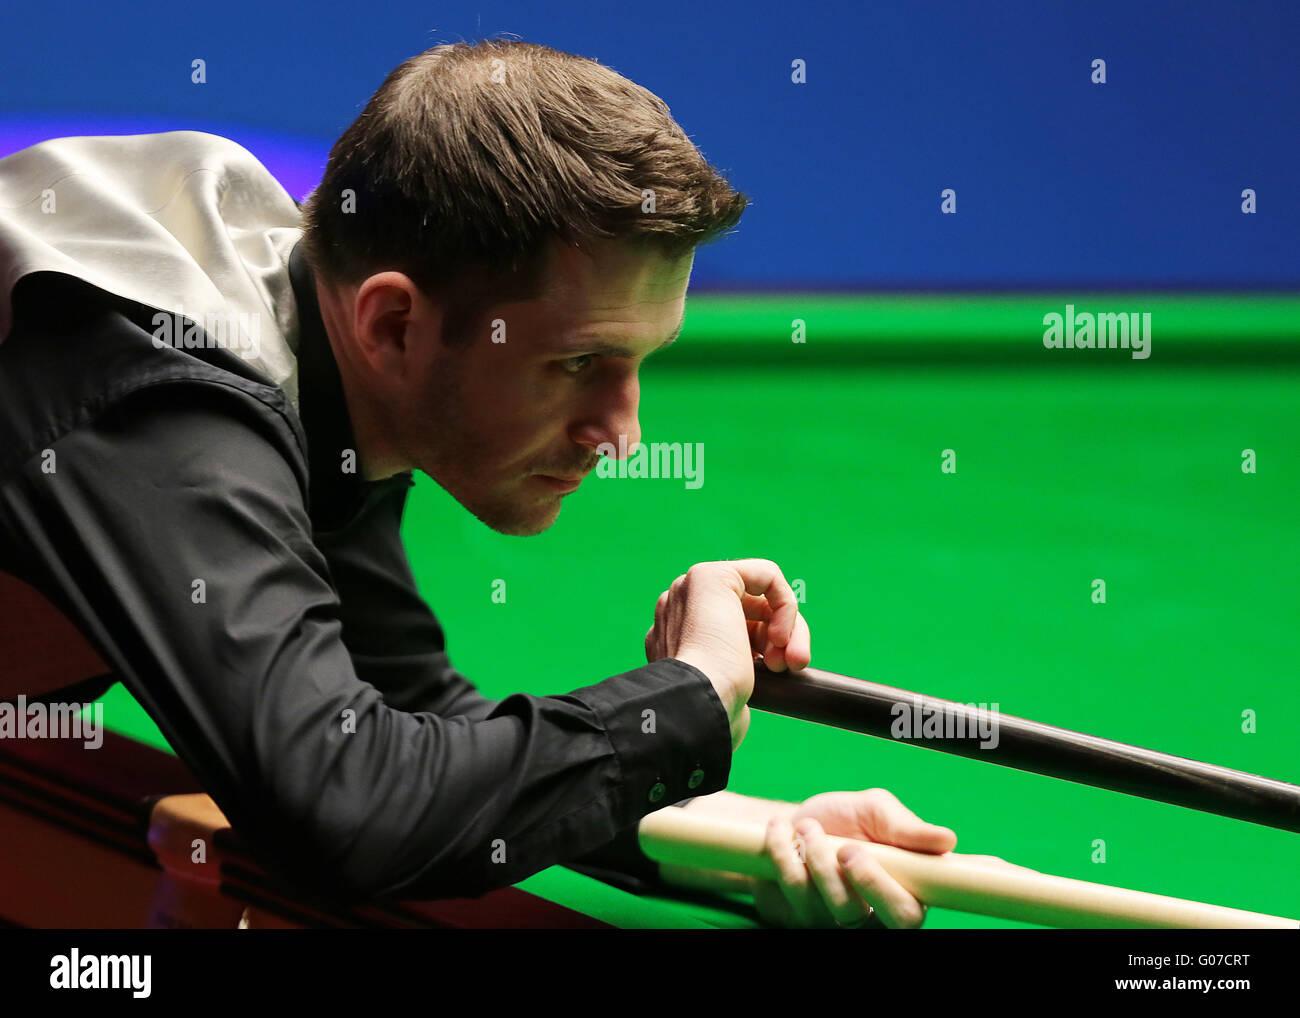 Der Tiegel, Sheffield, UK. 30. April 2016. World Snooker Championship. Halbfinale, Mark Selby gegen Marco Fu. Mark Stockbild